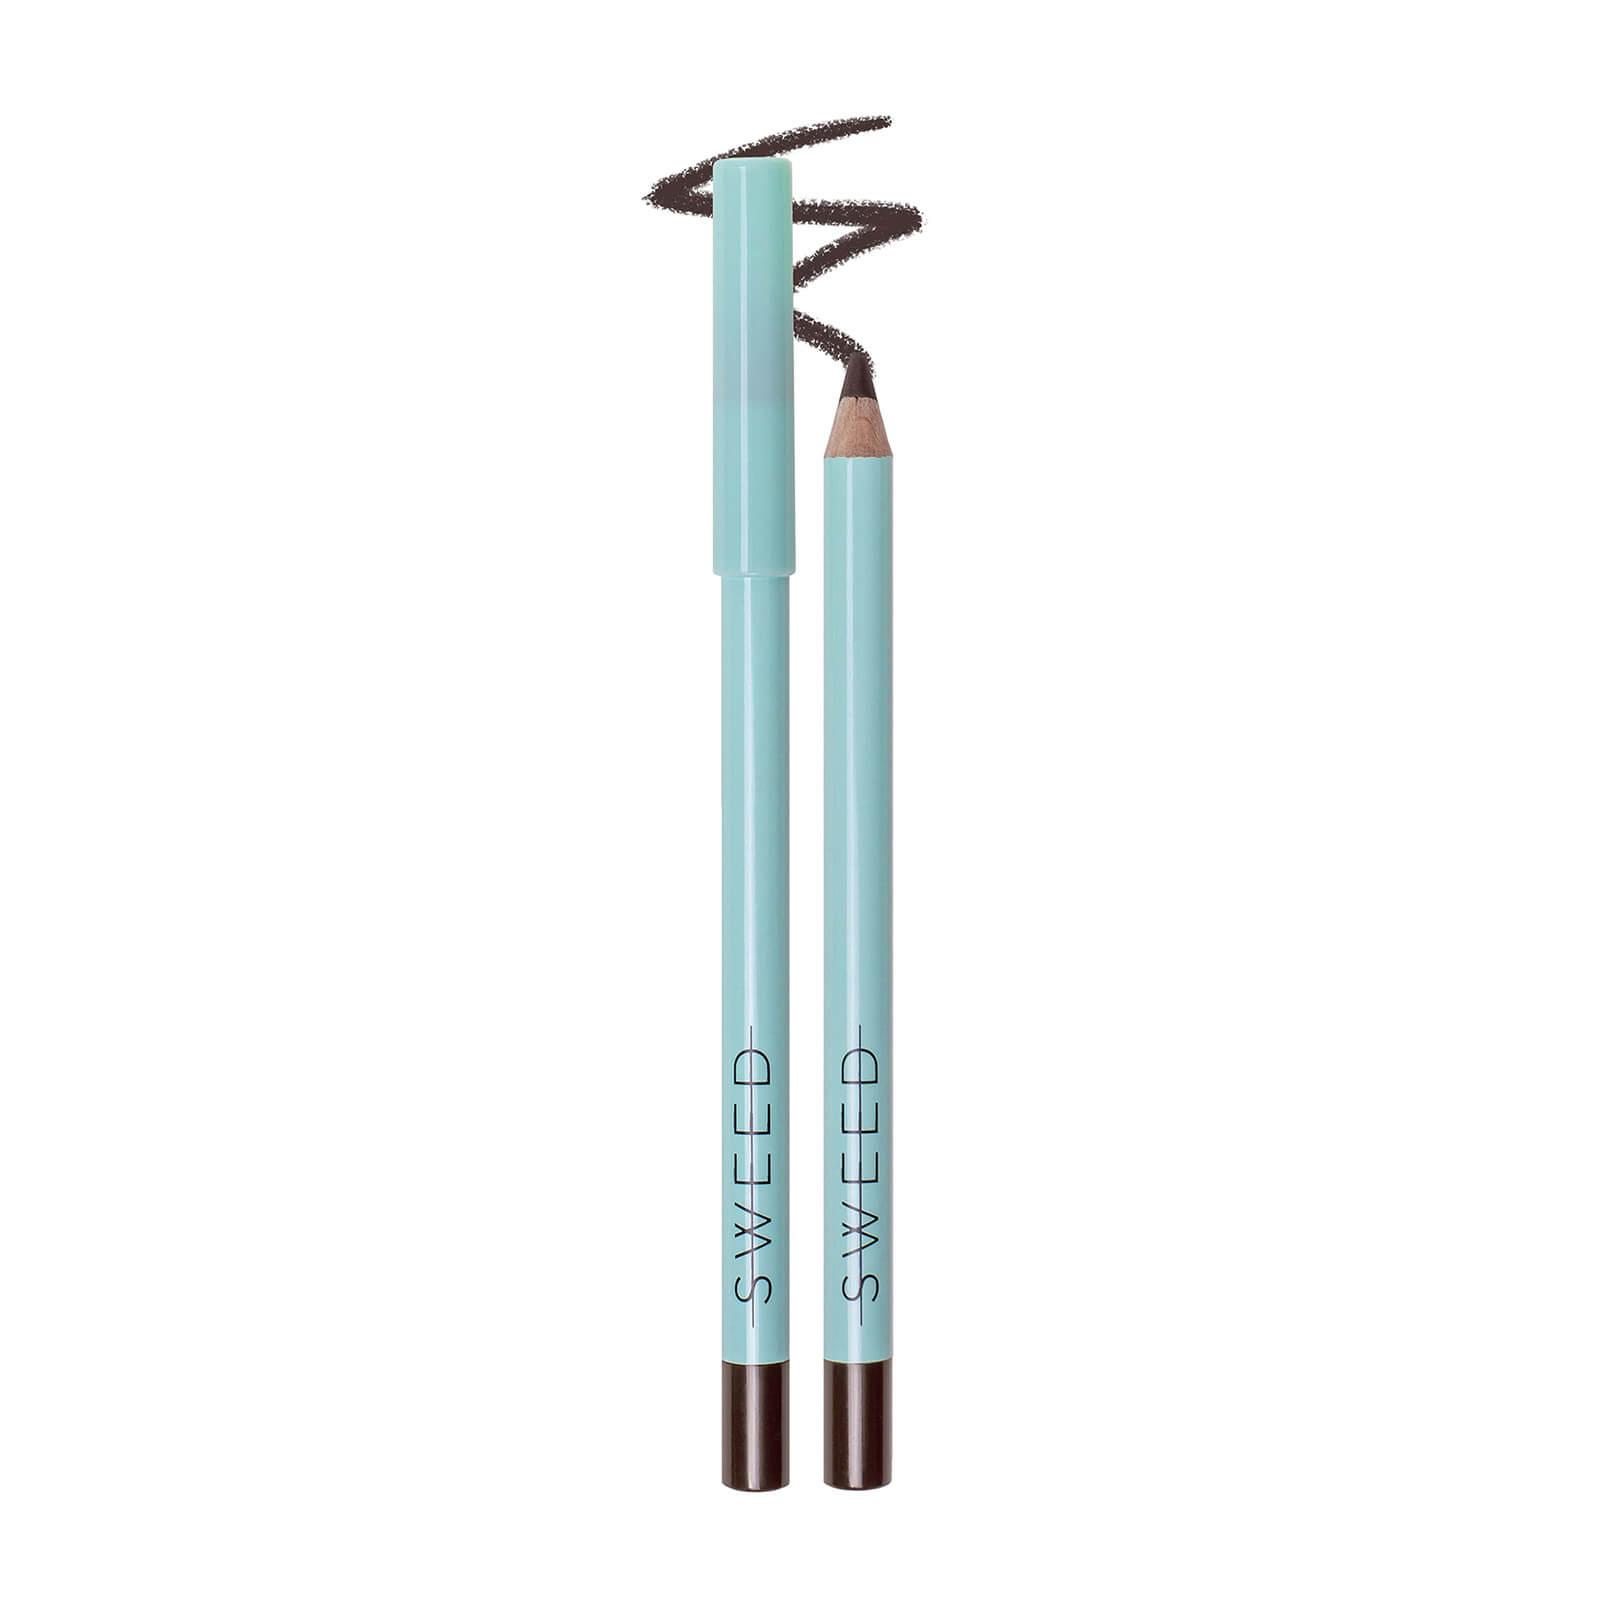 Купить Подводка для глаз Sweed Lashes Satin Kohl Eyeliner 2, 26 г (разные оттенки) - Dusty Brown